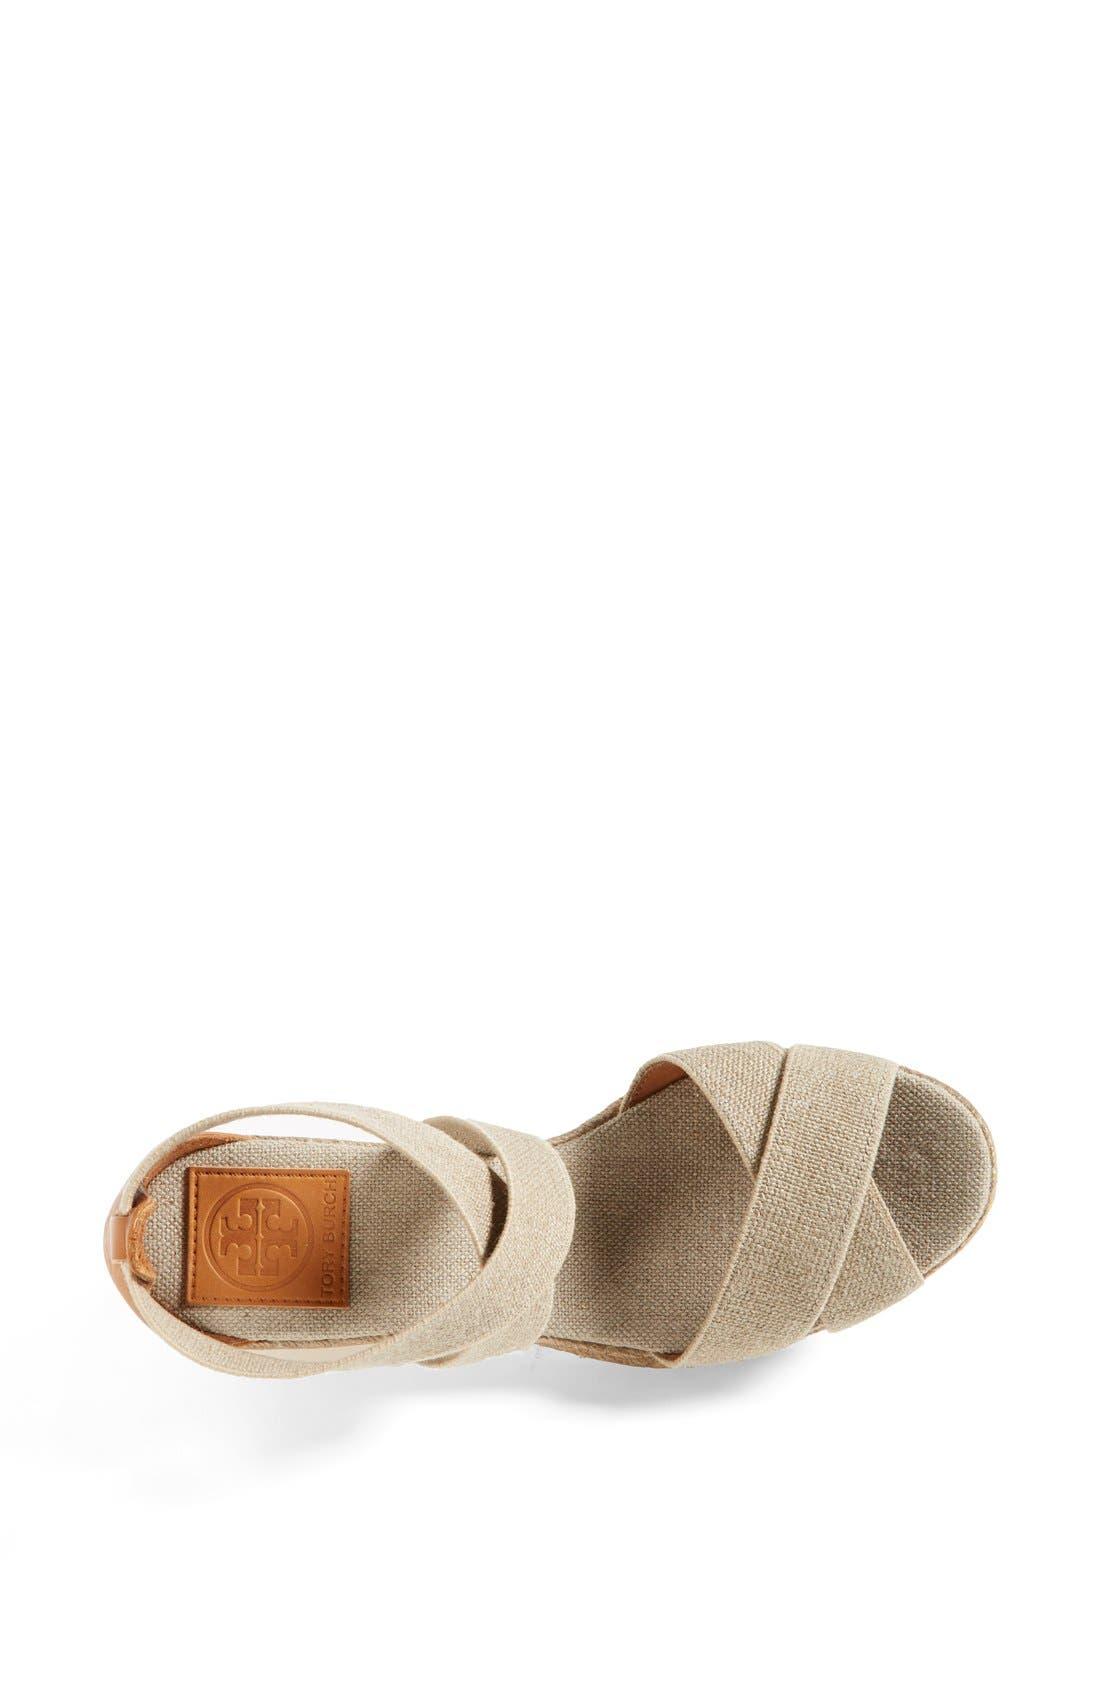 Alternate Image 3  - Tory Burch 'Adonis' Sandal (Online Only)